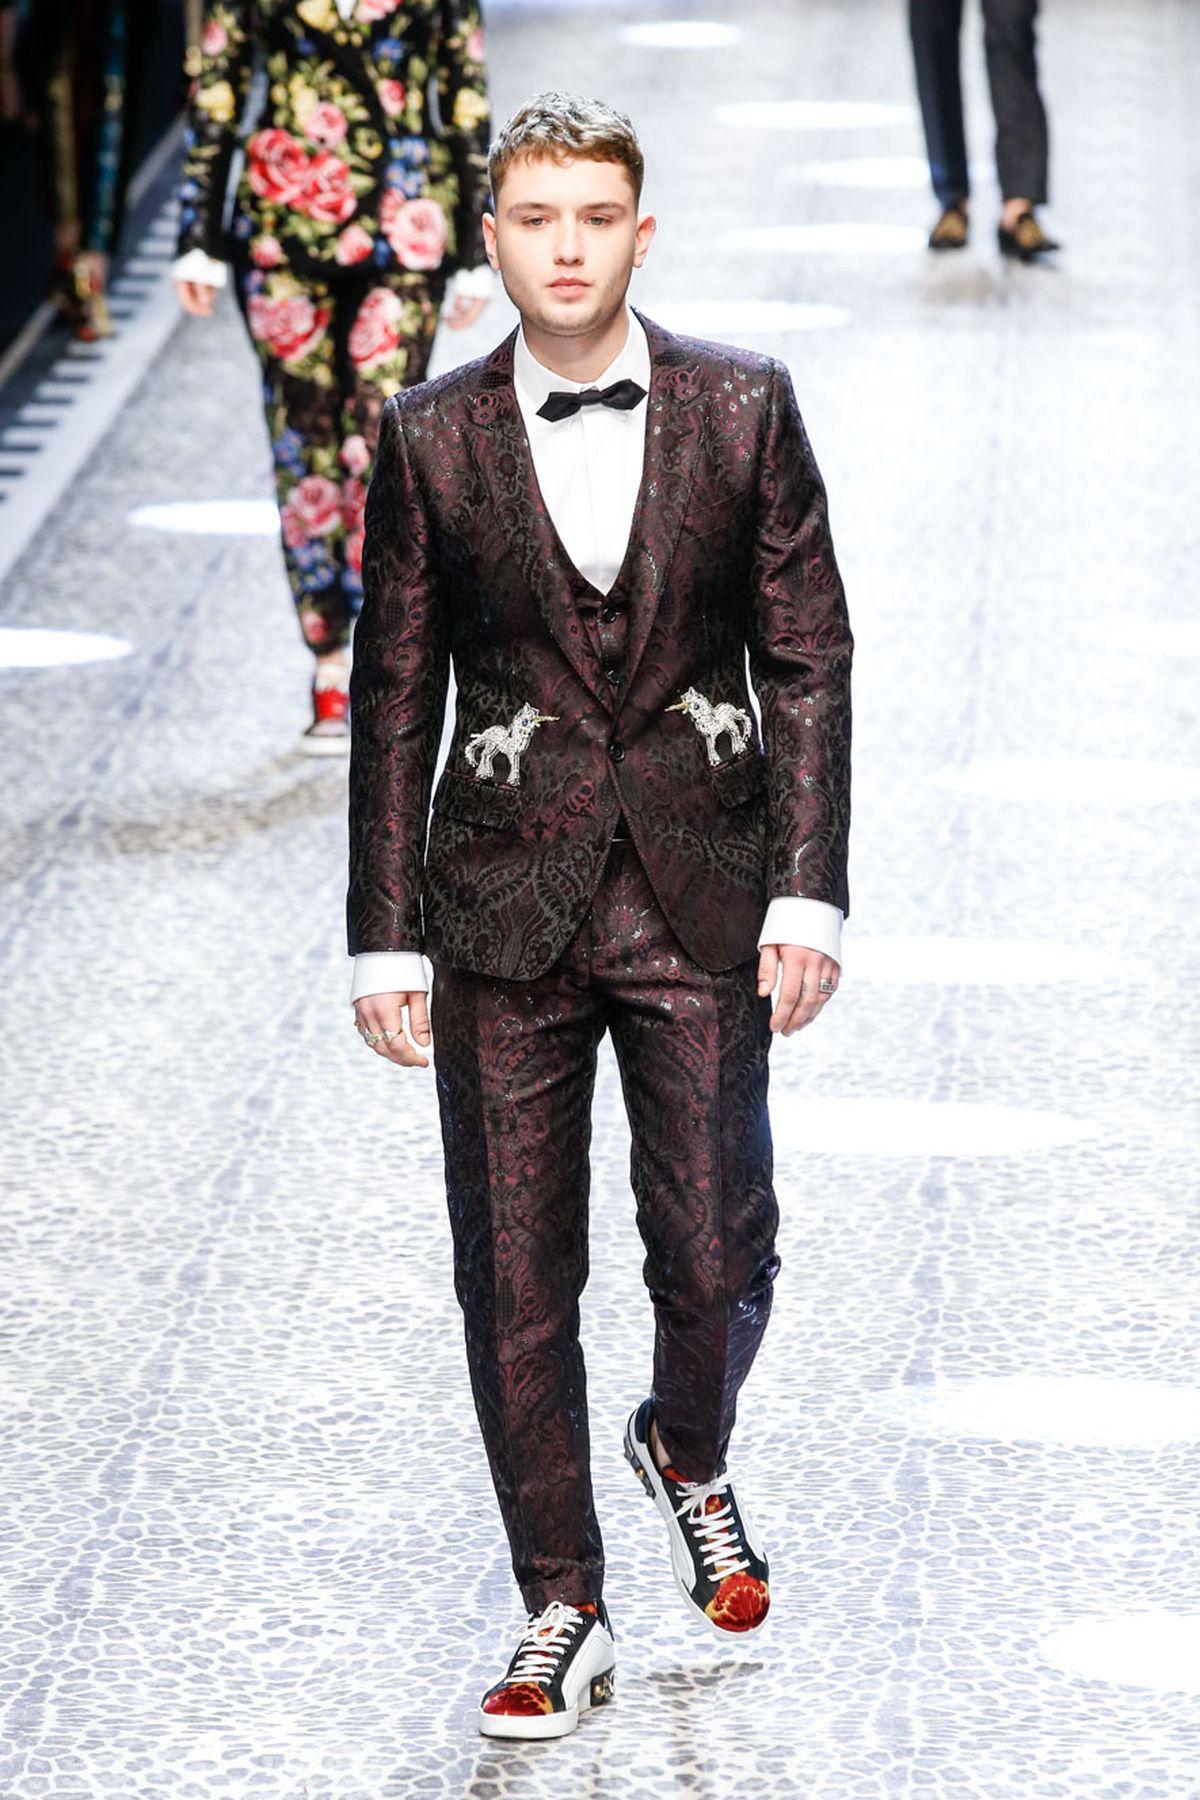 Milan Ready to Wear Fall/Winter 2017: Dolce & Gabbana kleiden Rafferty Law in feinem Zwirn UND sportlichen Sneakern